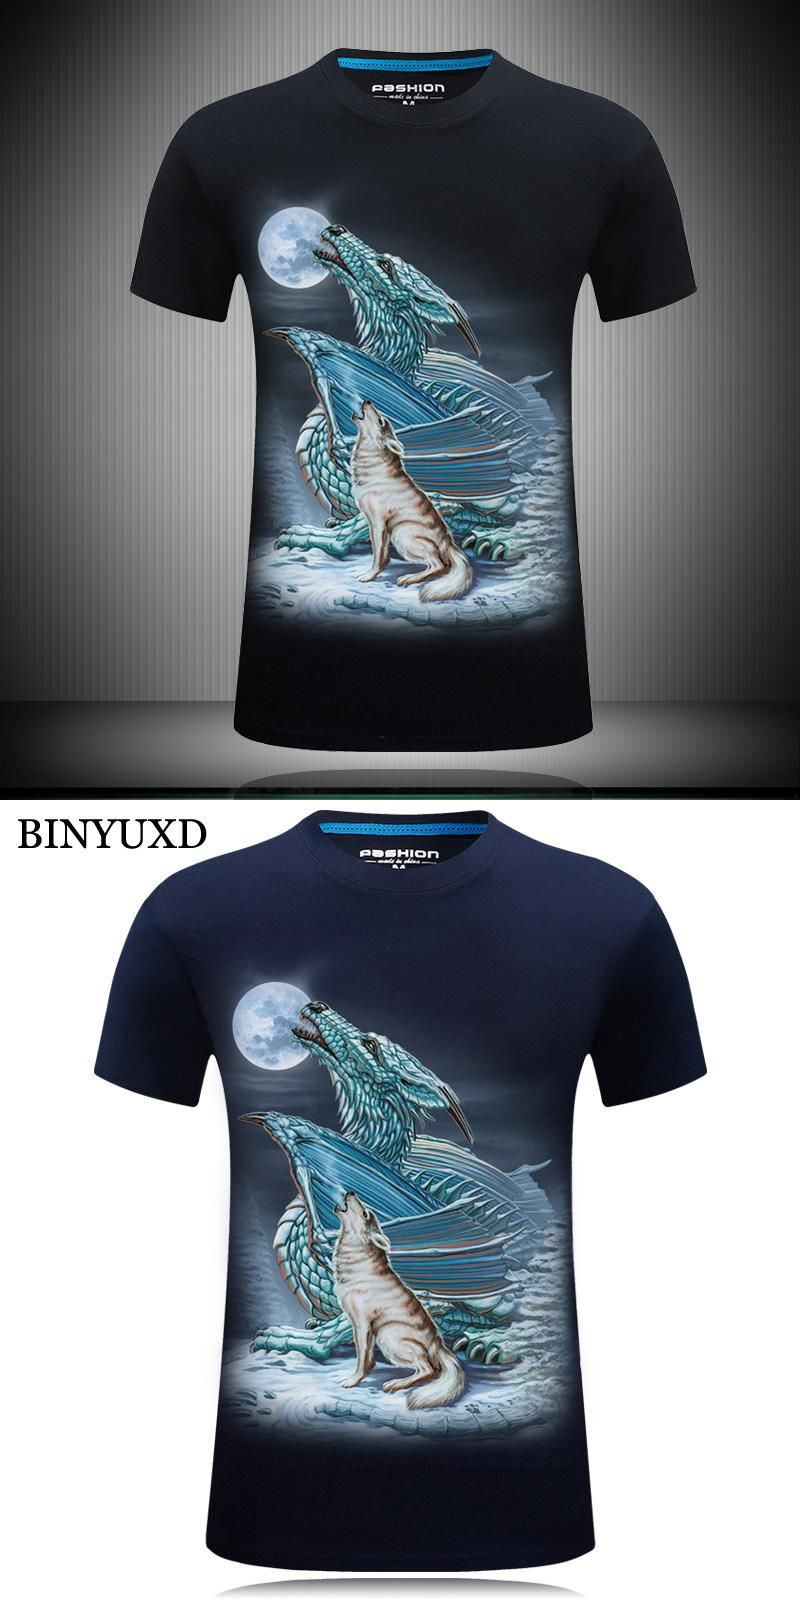 BINYUXD Cotton 3D Printed Dragon Tiger T Shirts Mens Brand Clothing 2017  Fashion Stylish Designer Tee cc0efb2e686a